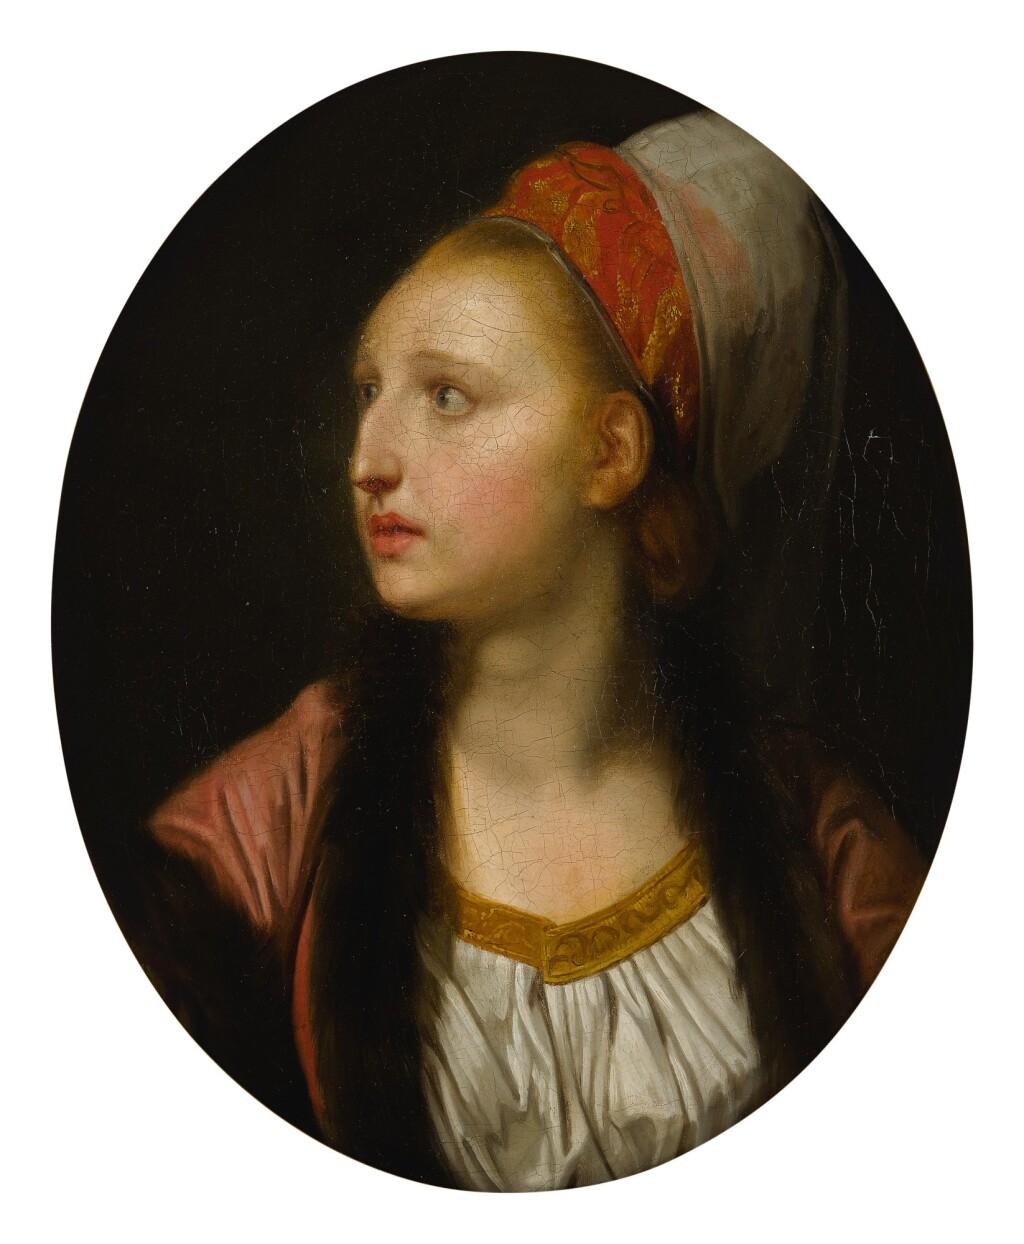 FOLLOWER OF JEAN-BAPTISTE GREUZE   PORTRAIT OF AN ACTRESS AS ROZANNE IN BAZAJET, PROBABLY FRANÇOISE-MARIE-ANTOINETTE-JOSEPH SAUEROTTE, CALLED MADEMOISELLE RAUCOURT (1756-1815), BUST LENGTH